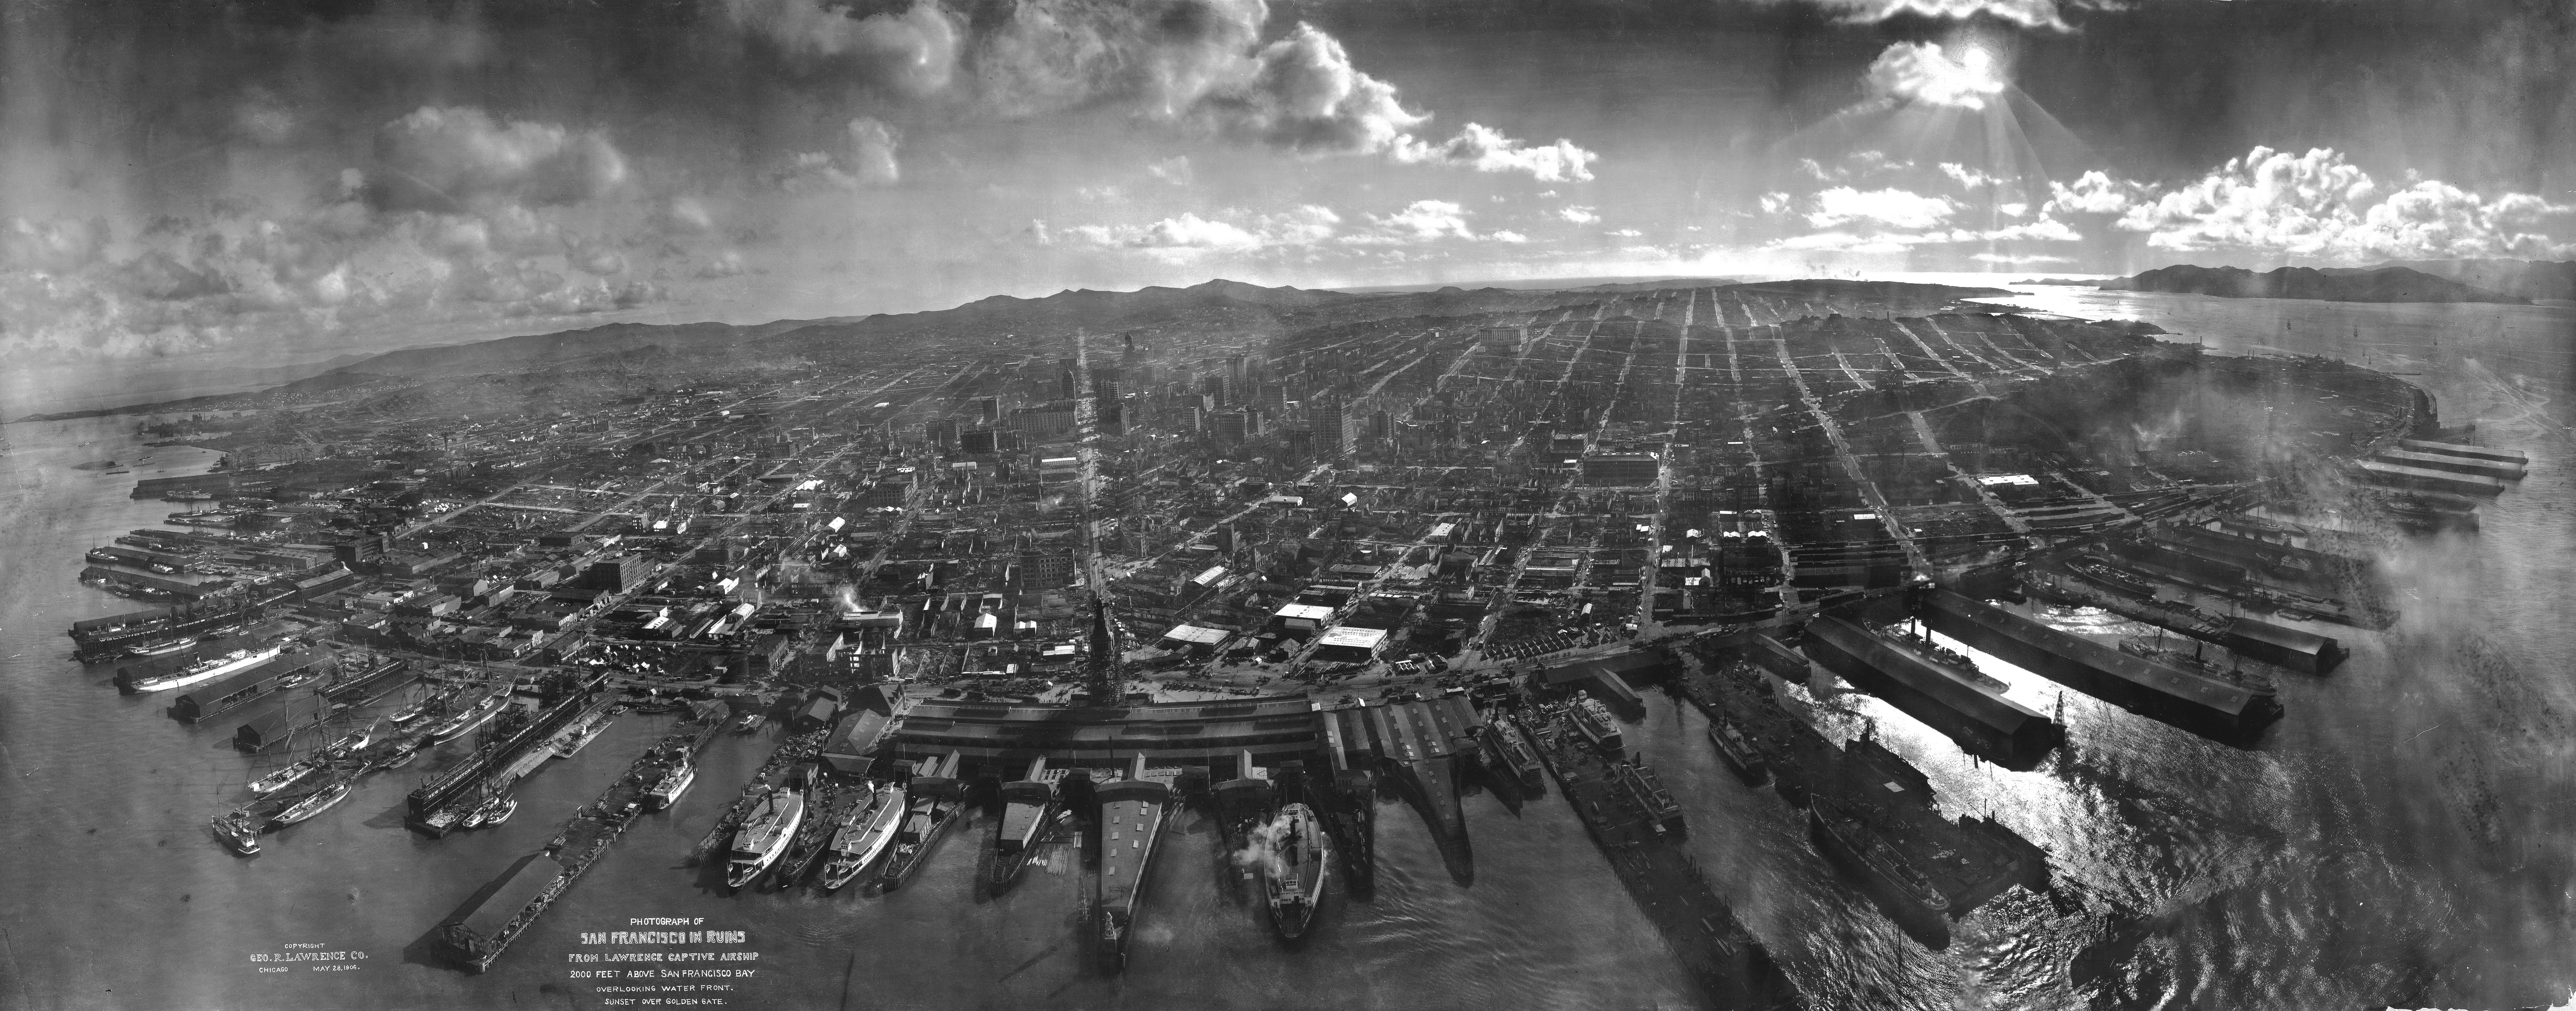 San_Francisco_in_ruin_edit2